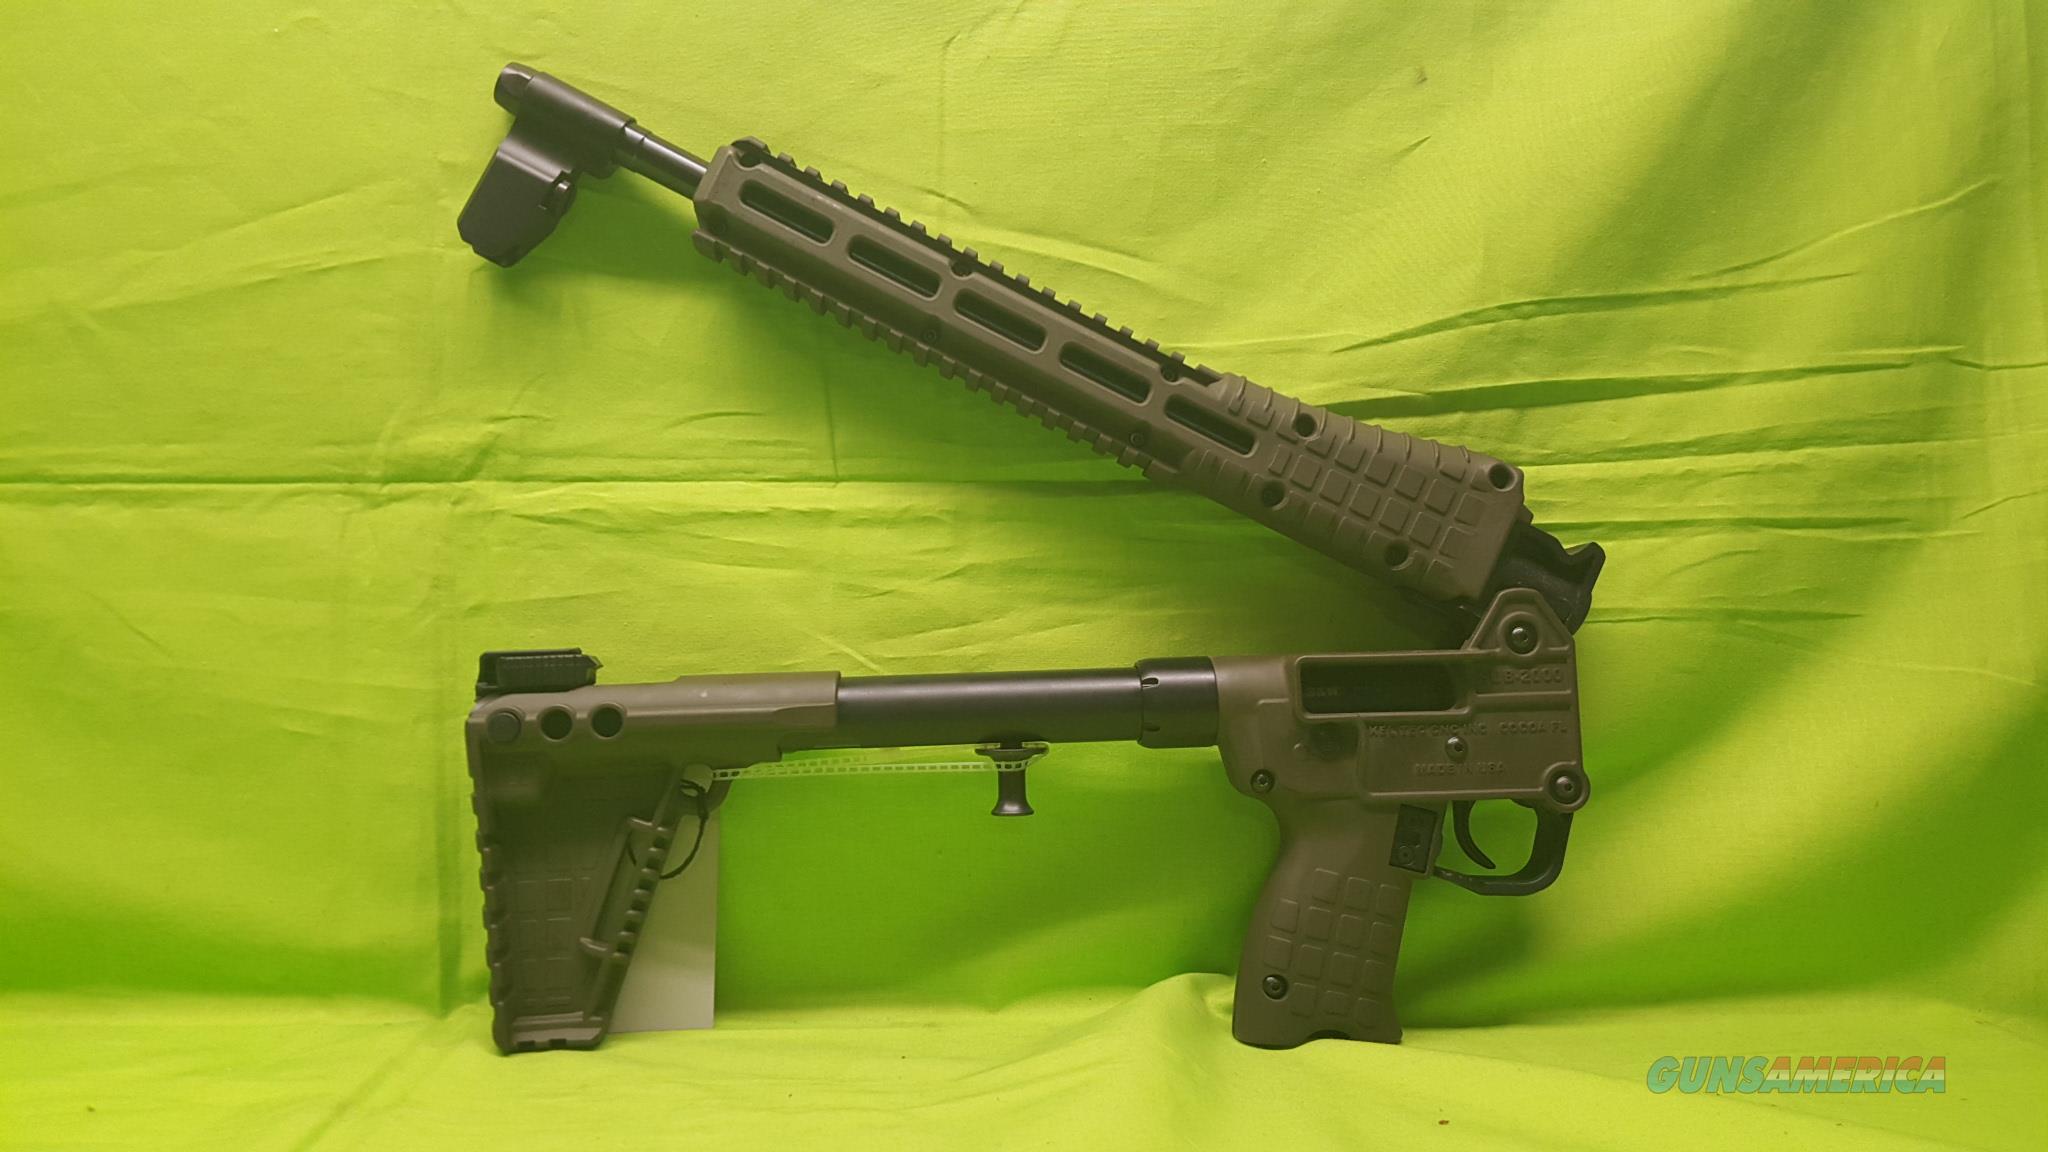 KELTEC SUB 2K 2000 G2 40 S&W GLOCK 23 GREEN ODG  Guns > Rifles > Kel-Tec Rifles